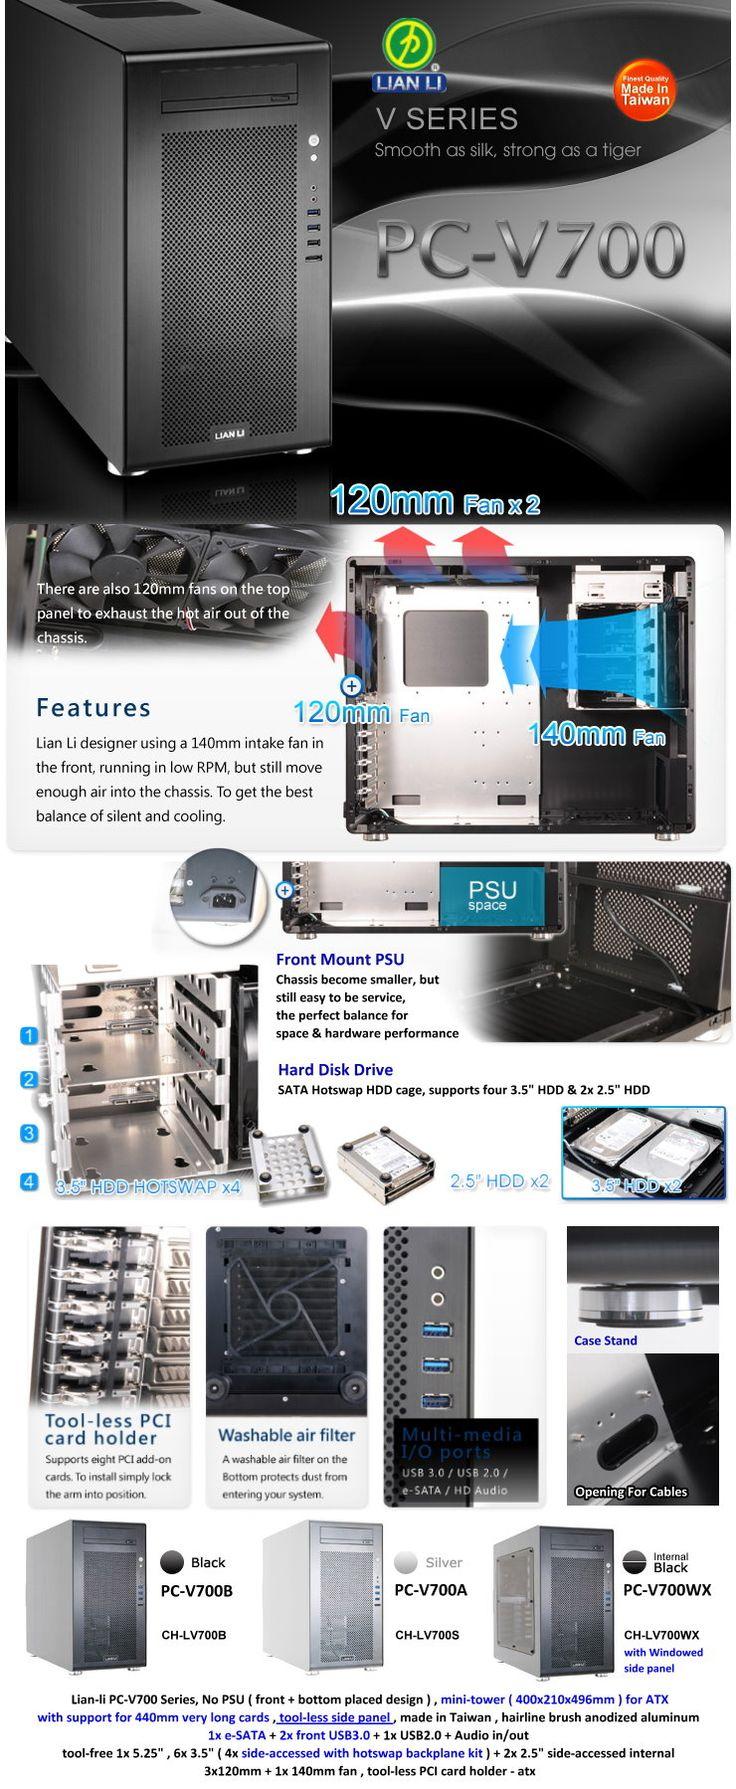 V-series PC-V700